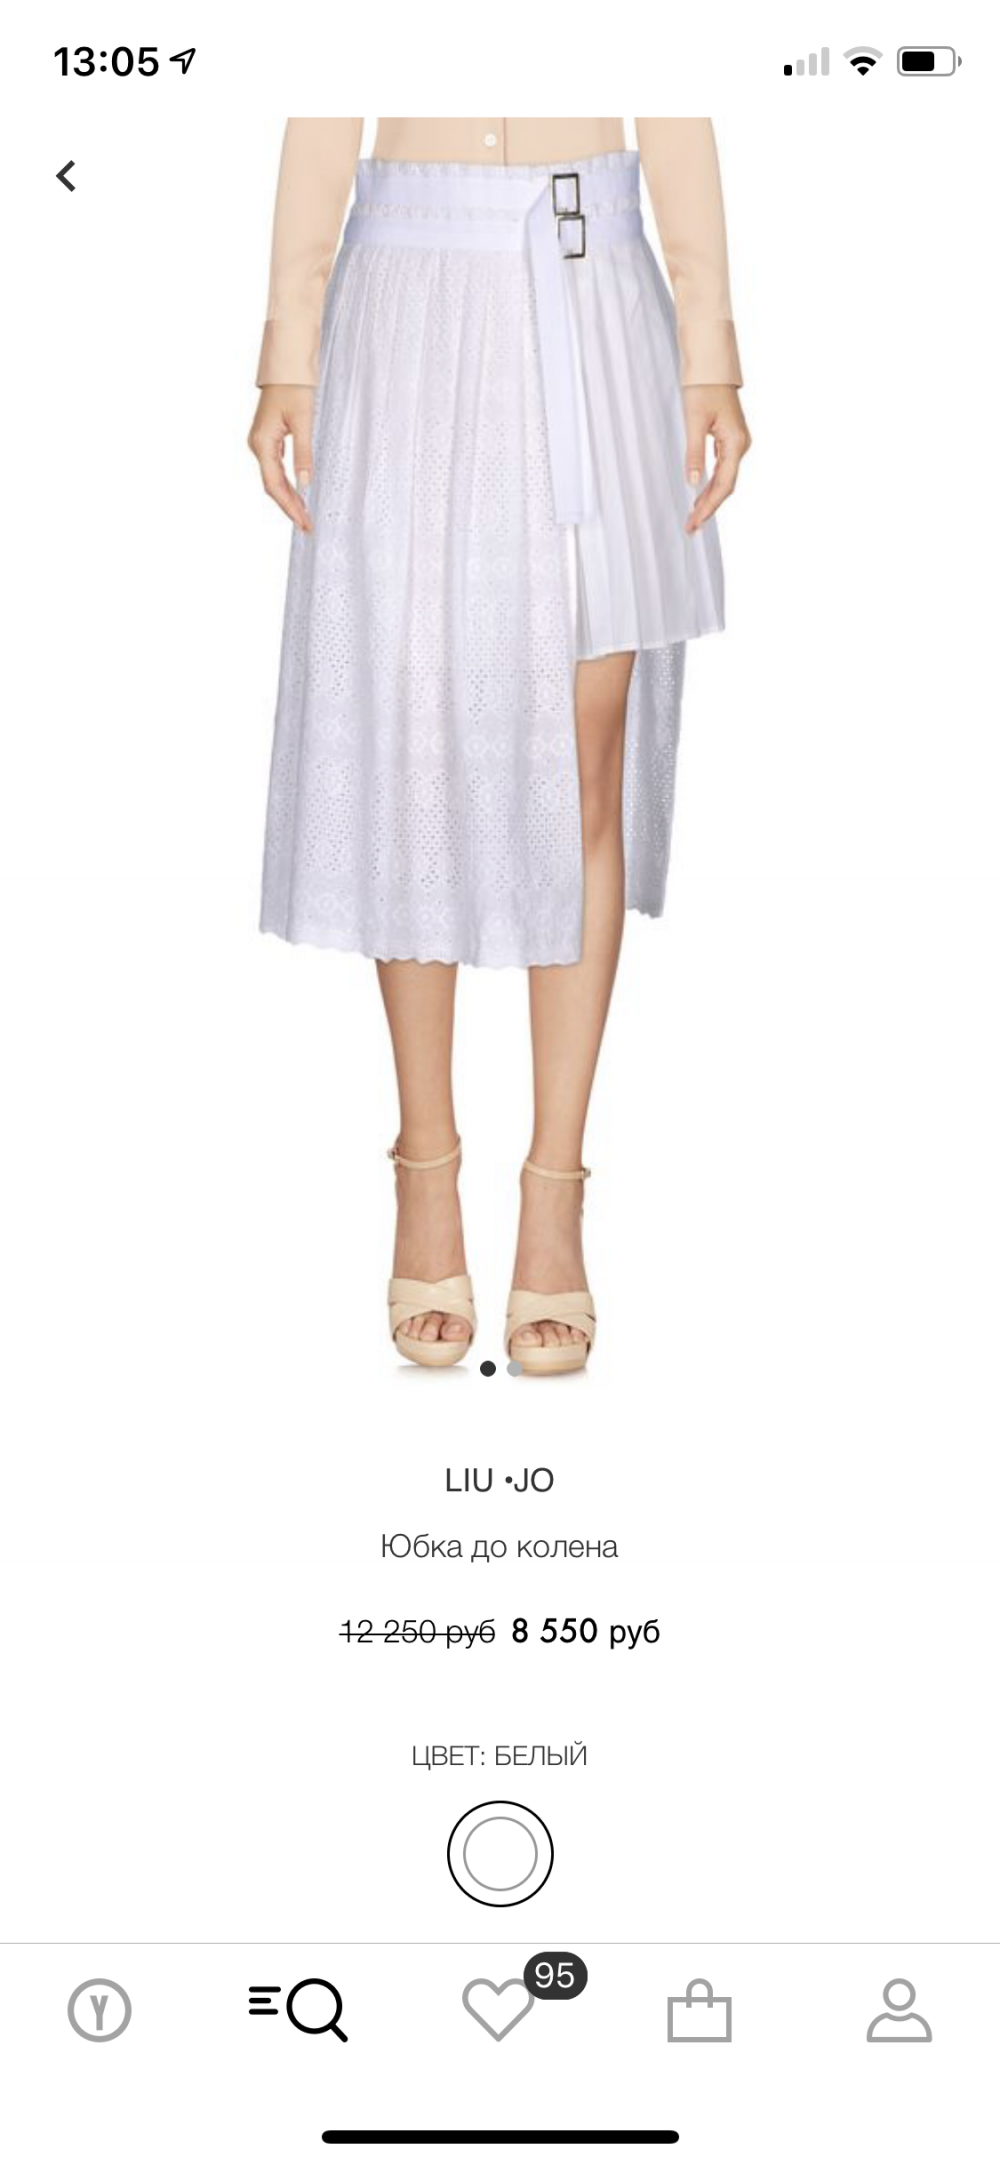 Liu Jo юбка, 44 размер